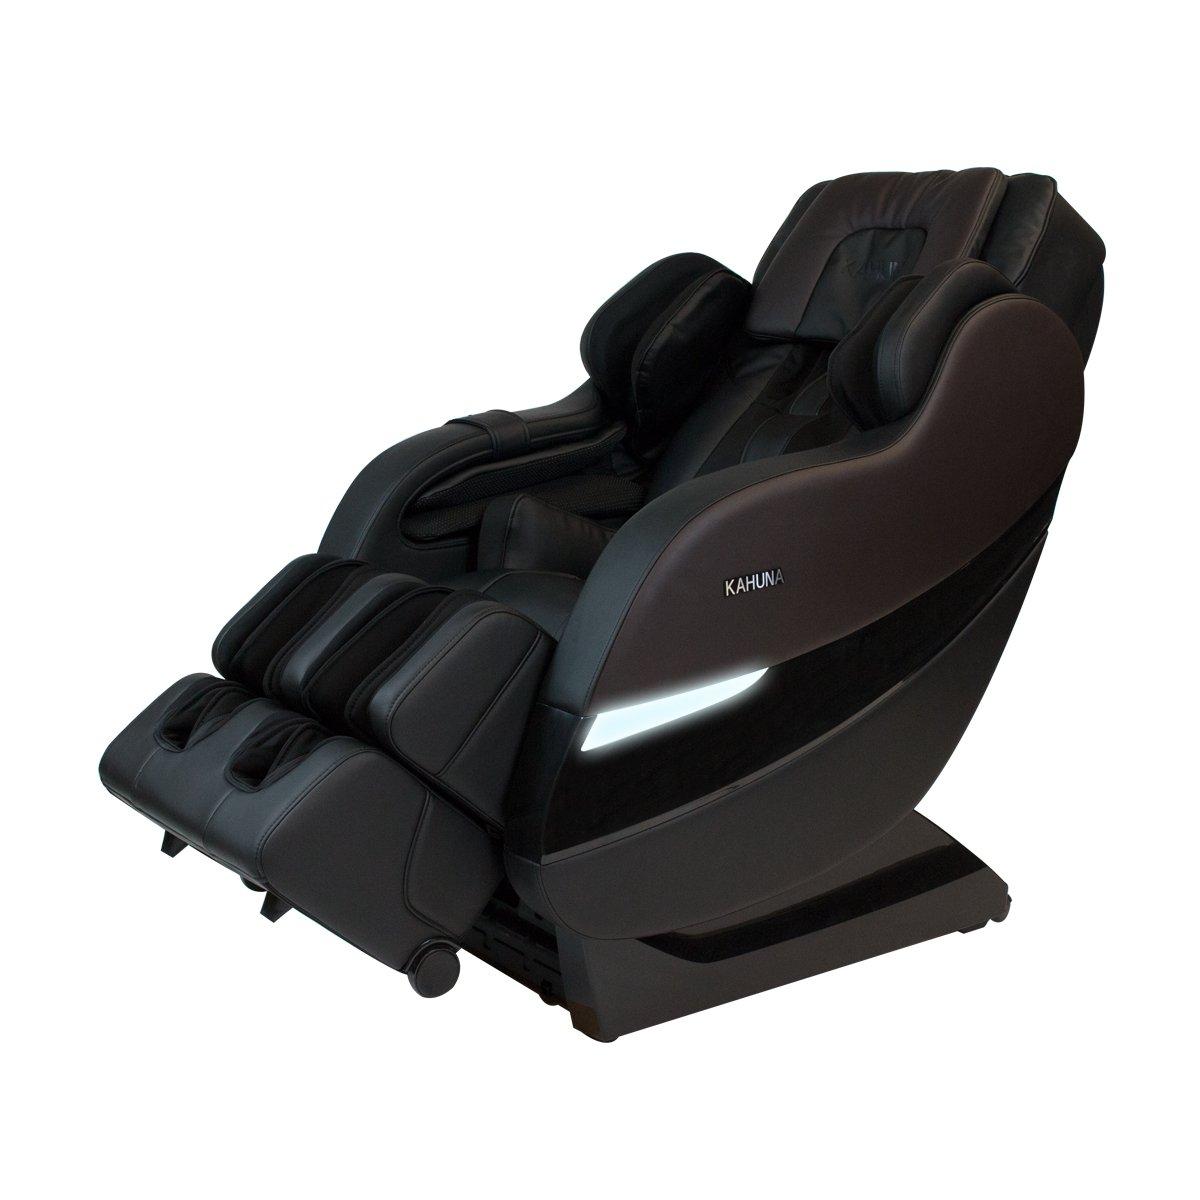 Kahuna Massage Chair SM-7300